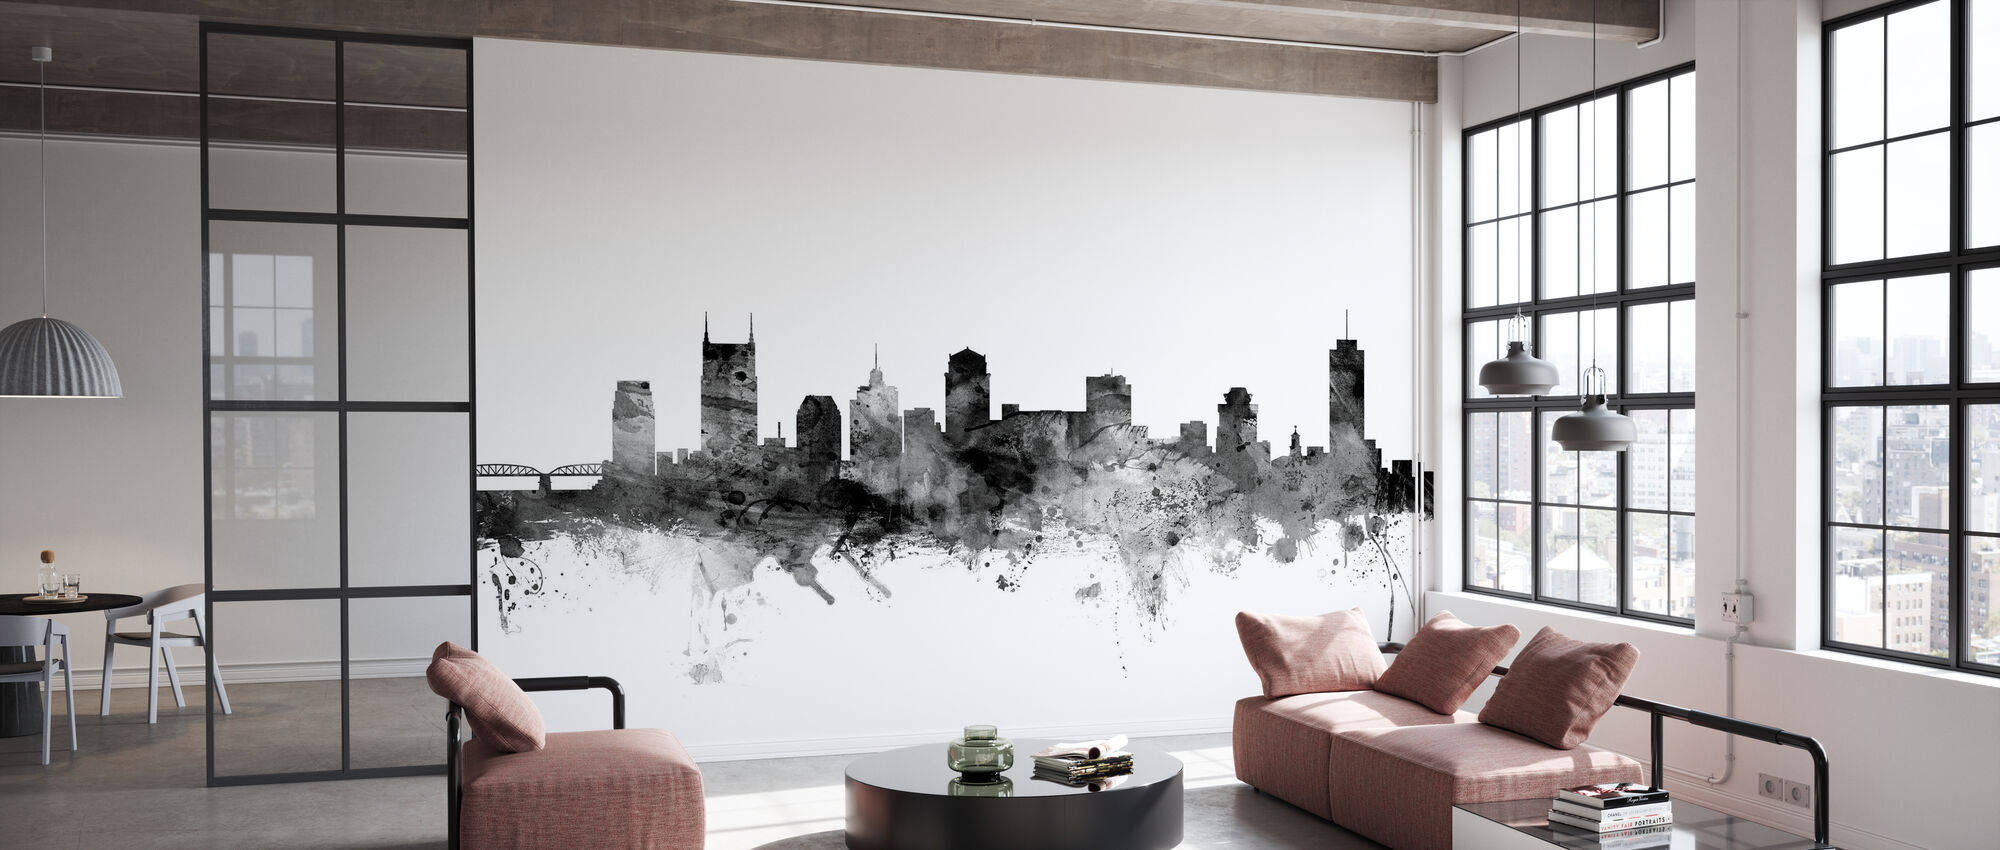 Nashville Tennessee Skyline Black - Wallpaper - Office